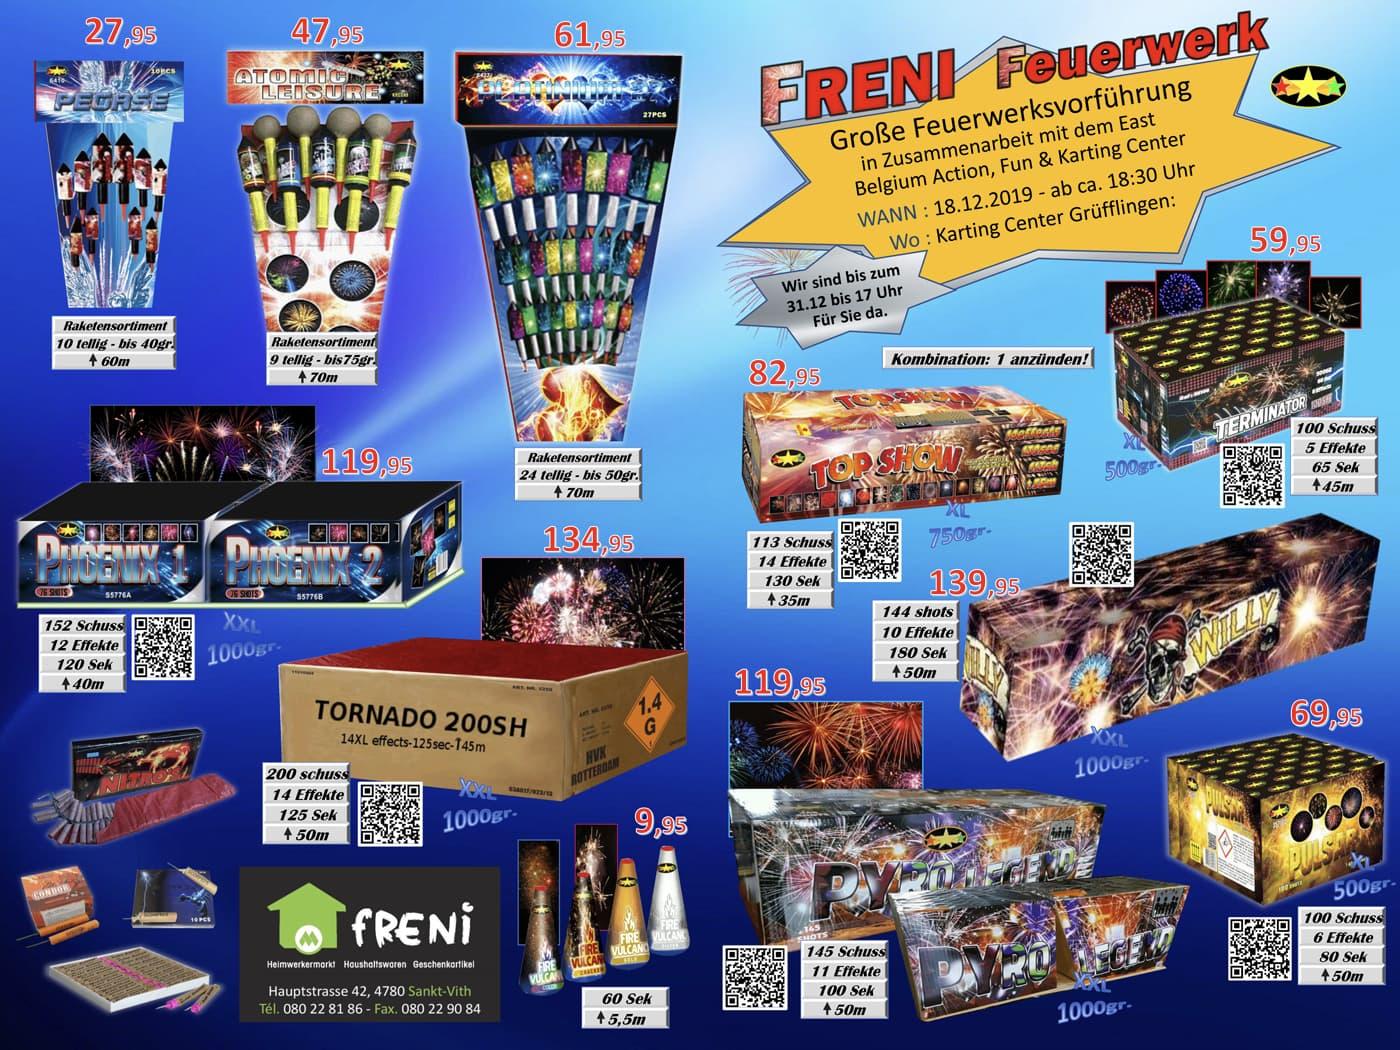 Feuerwerk Freni 1